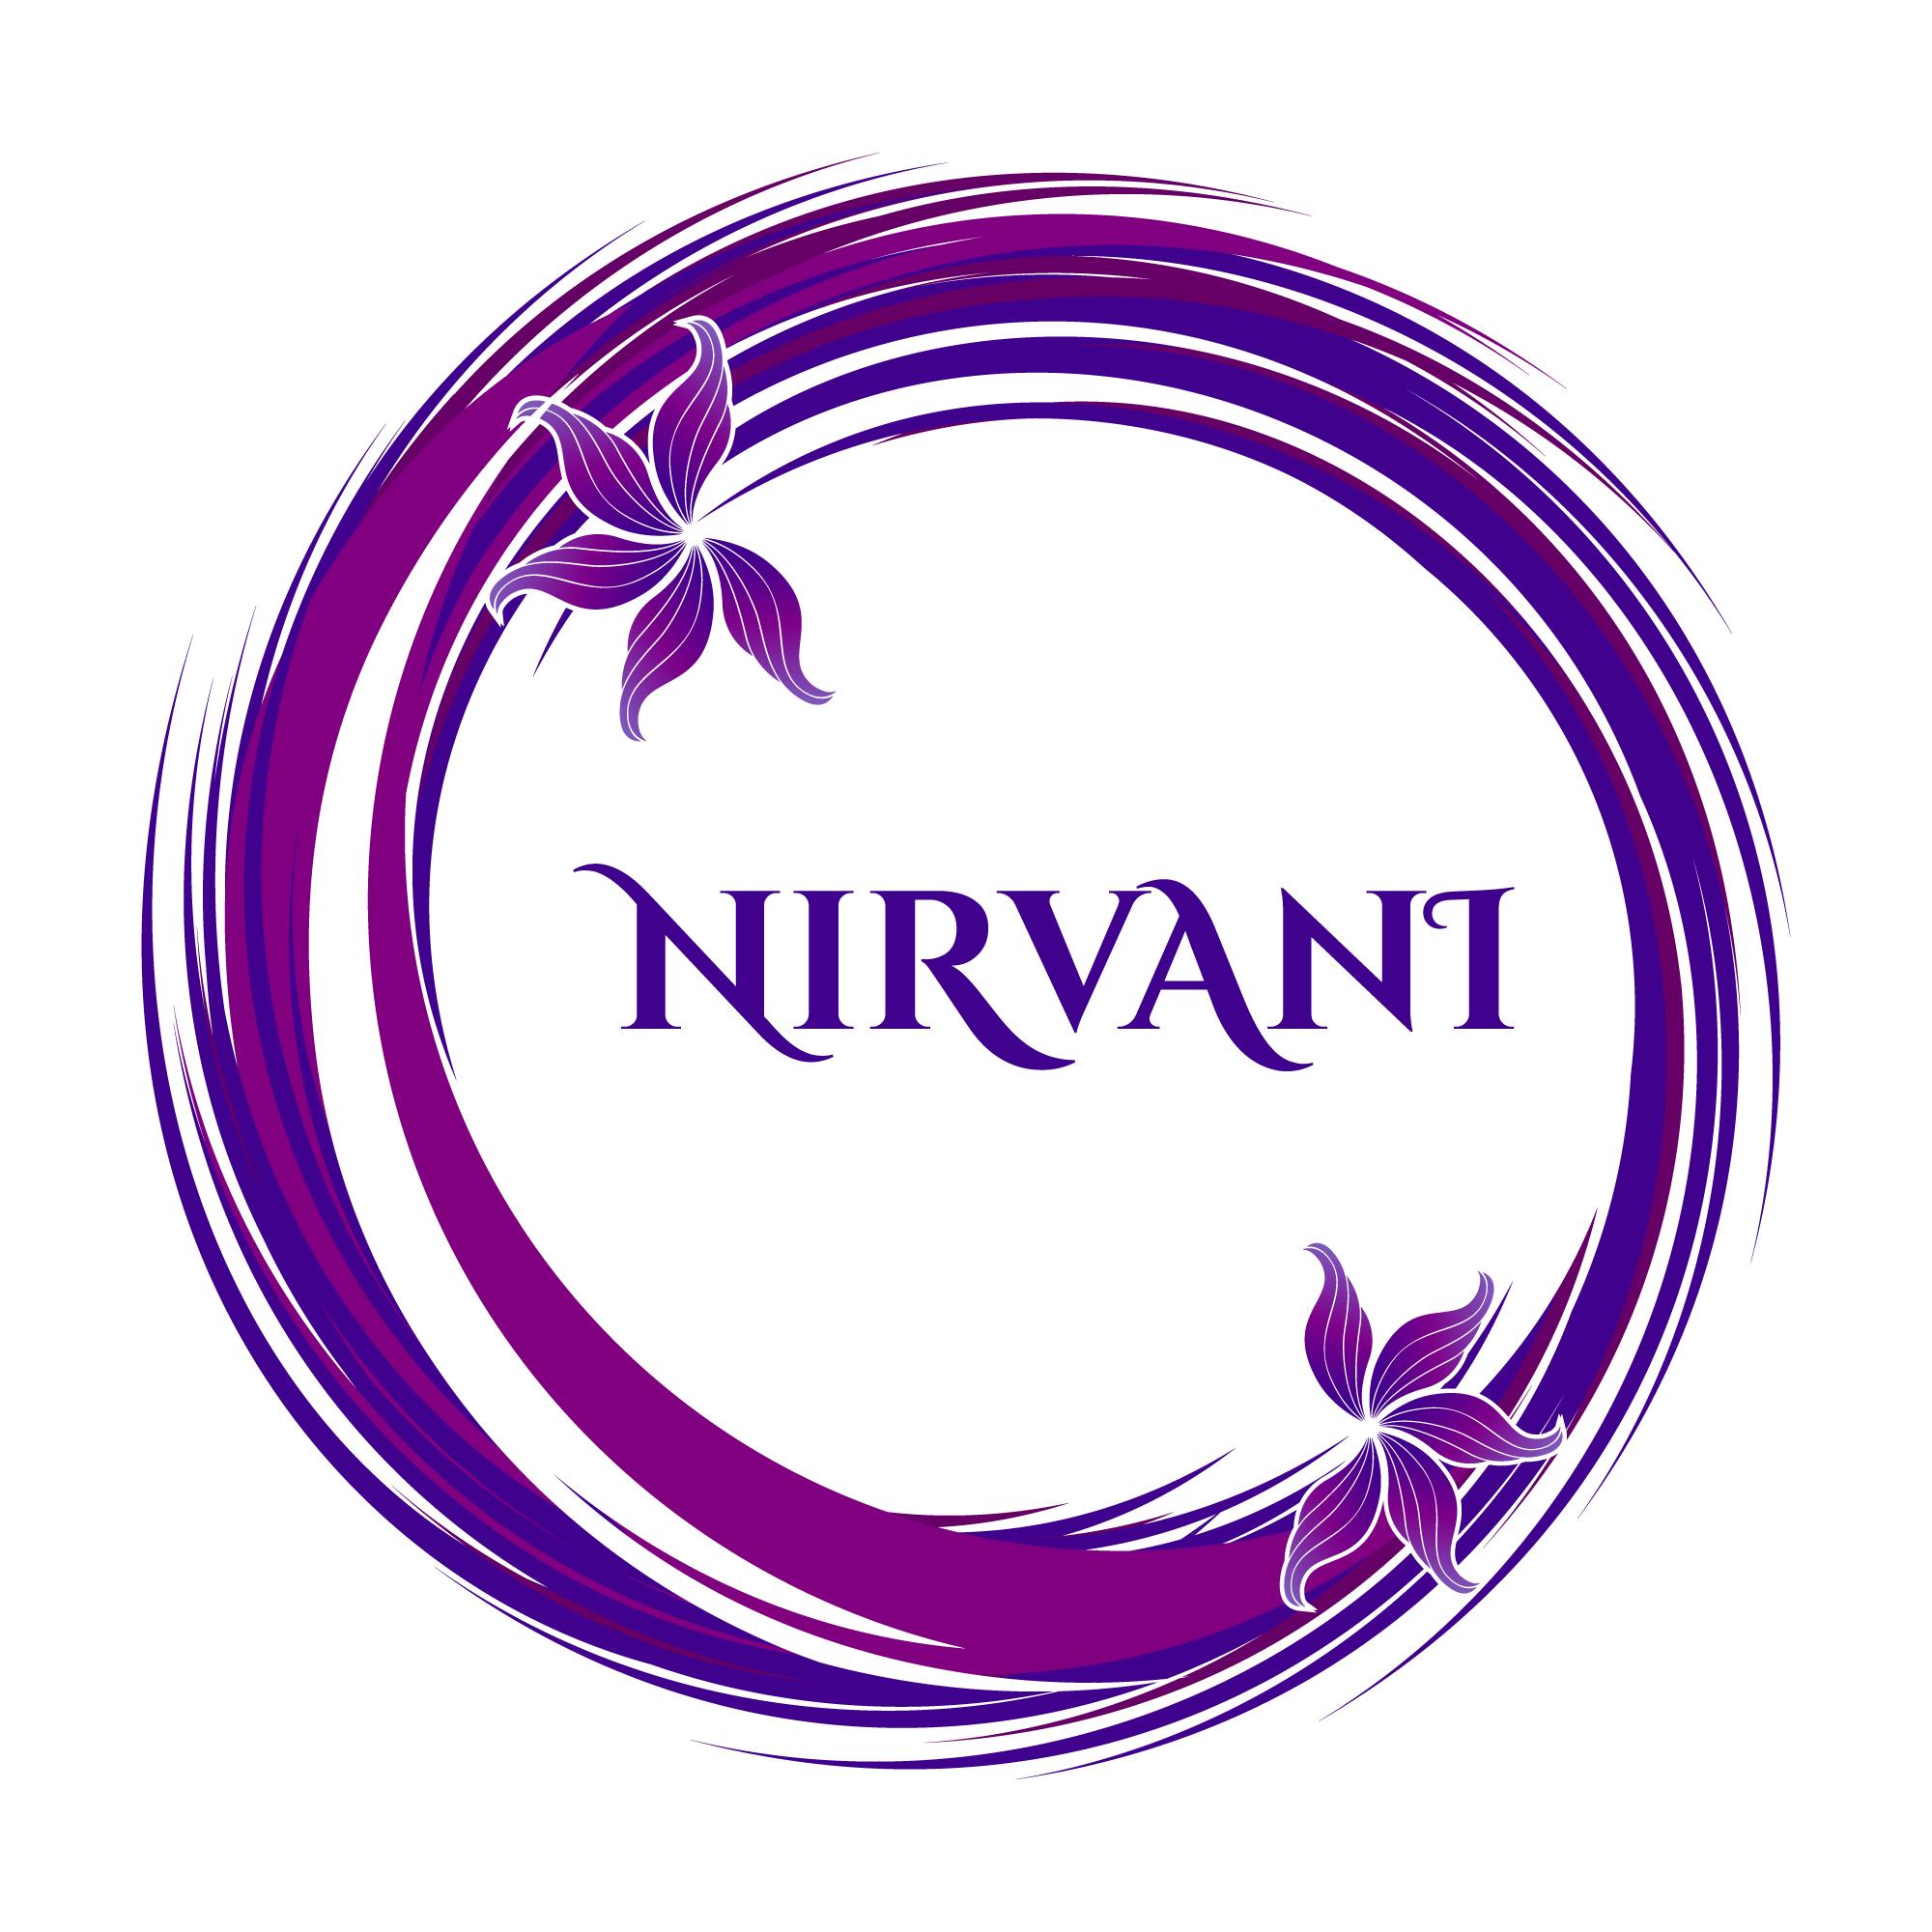 NirvaniLogo 4.1.18.jpg